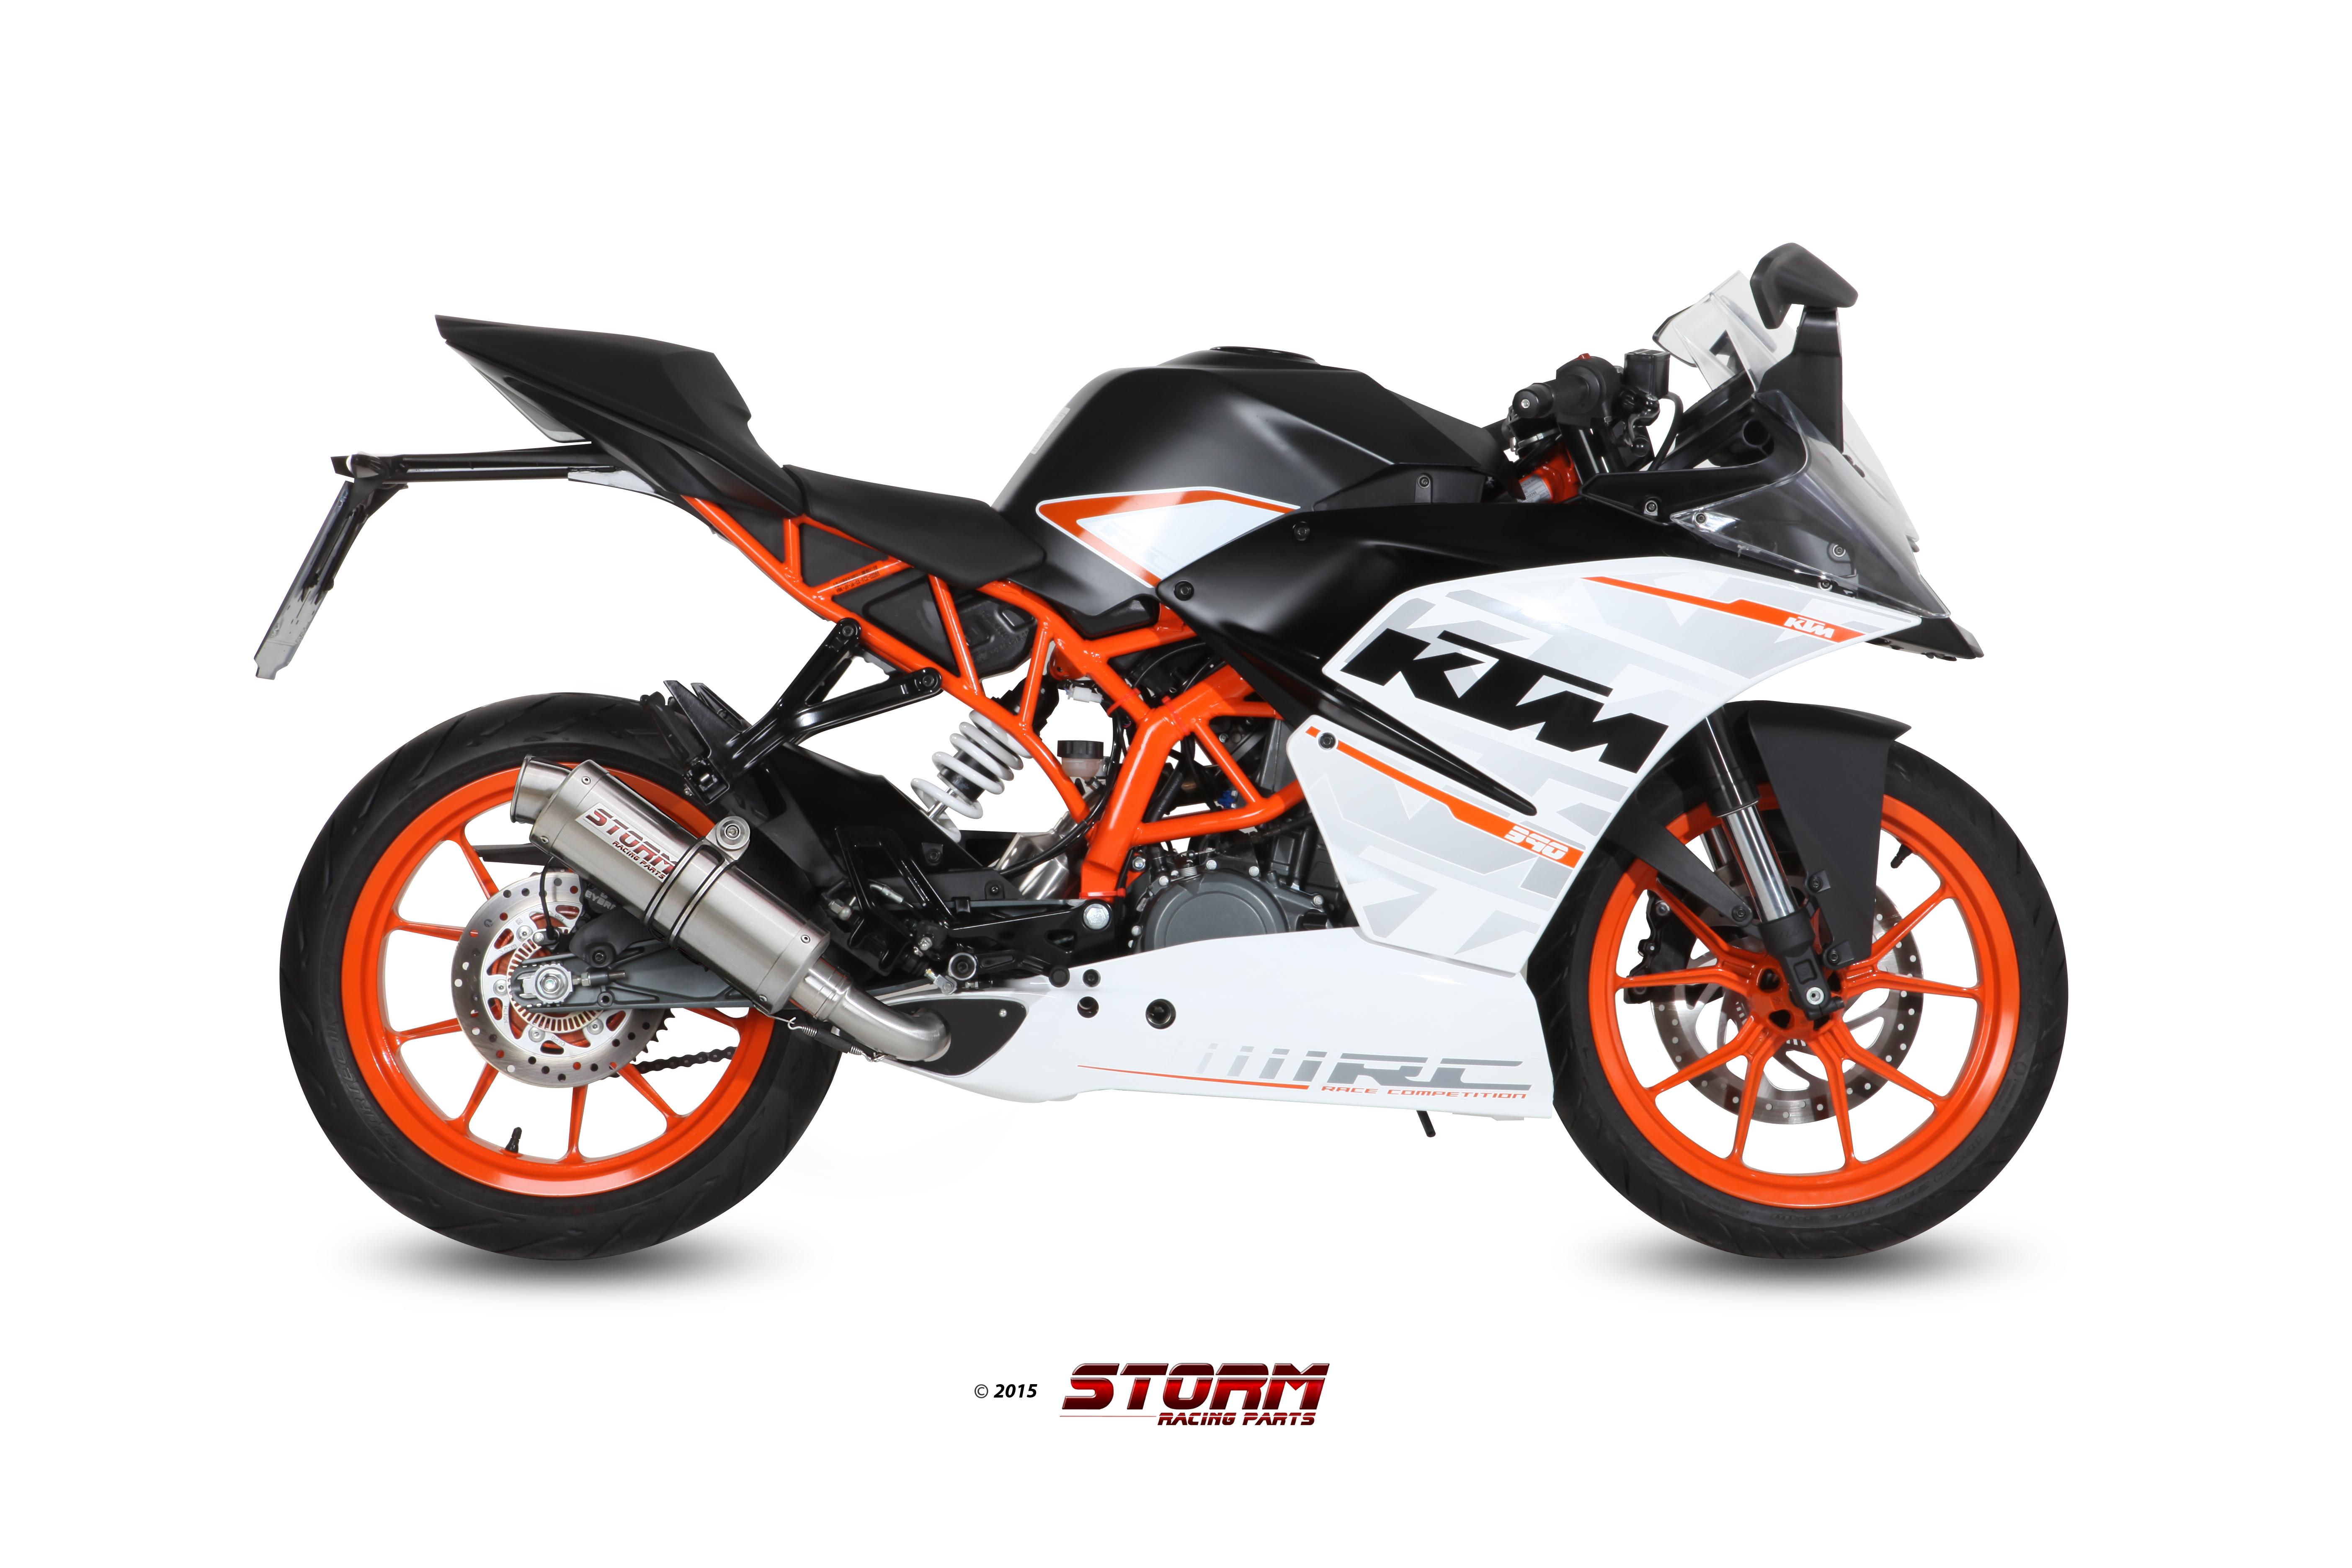 Scarico KTM RC 390 Storm Gp Inox KT.015.LXS